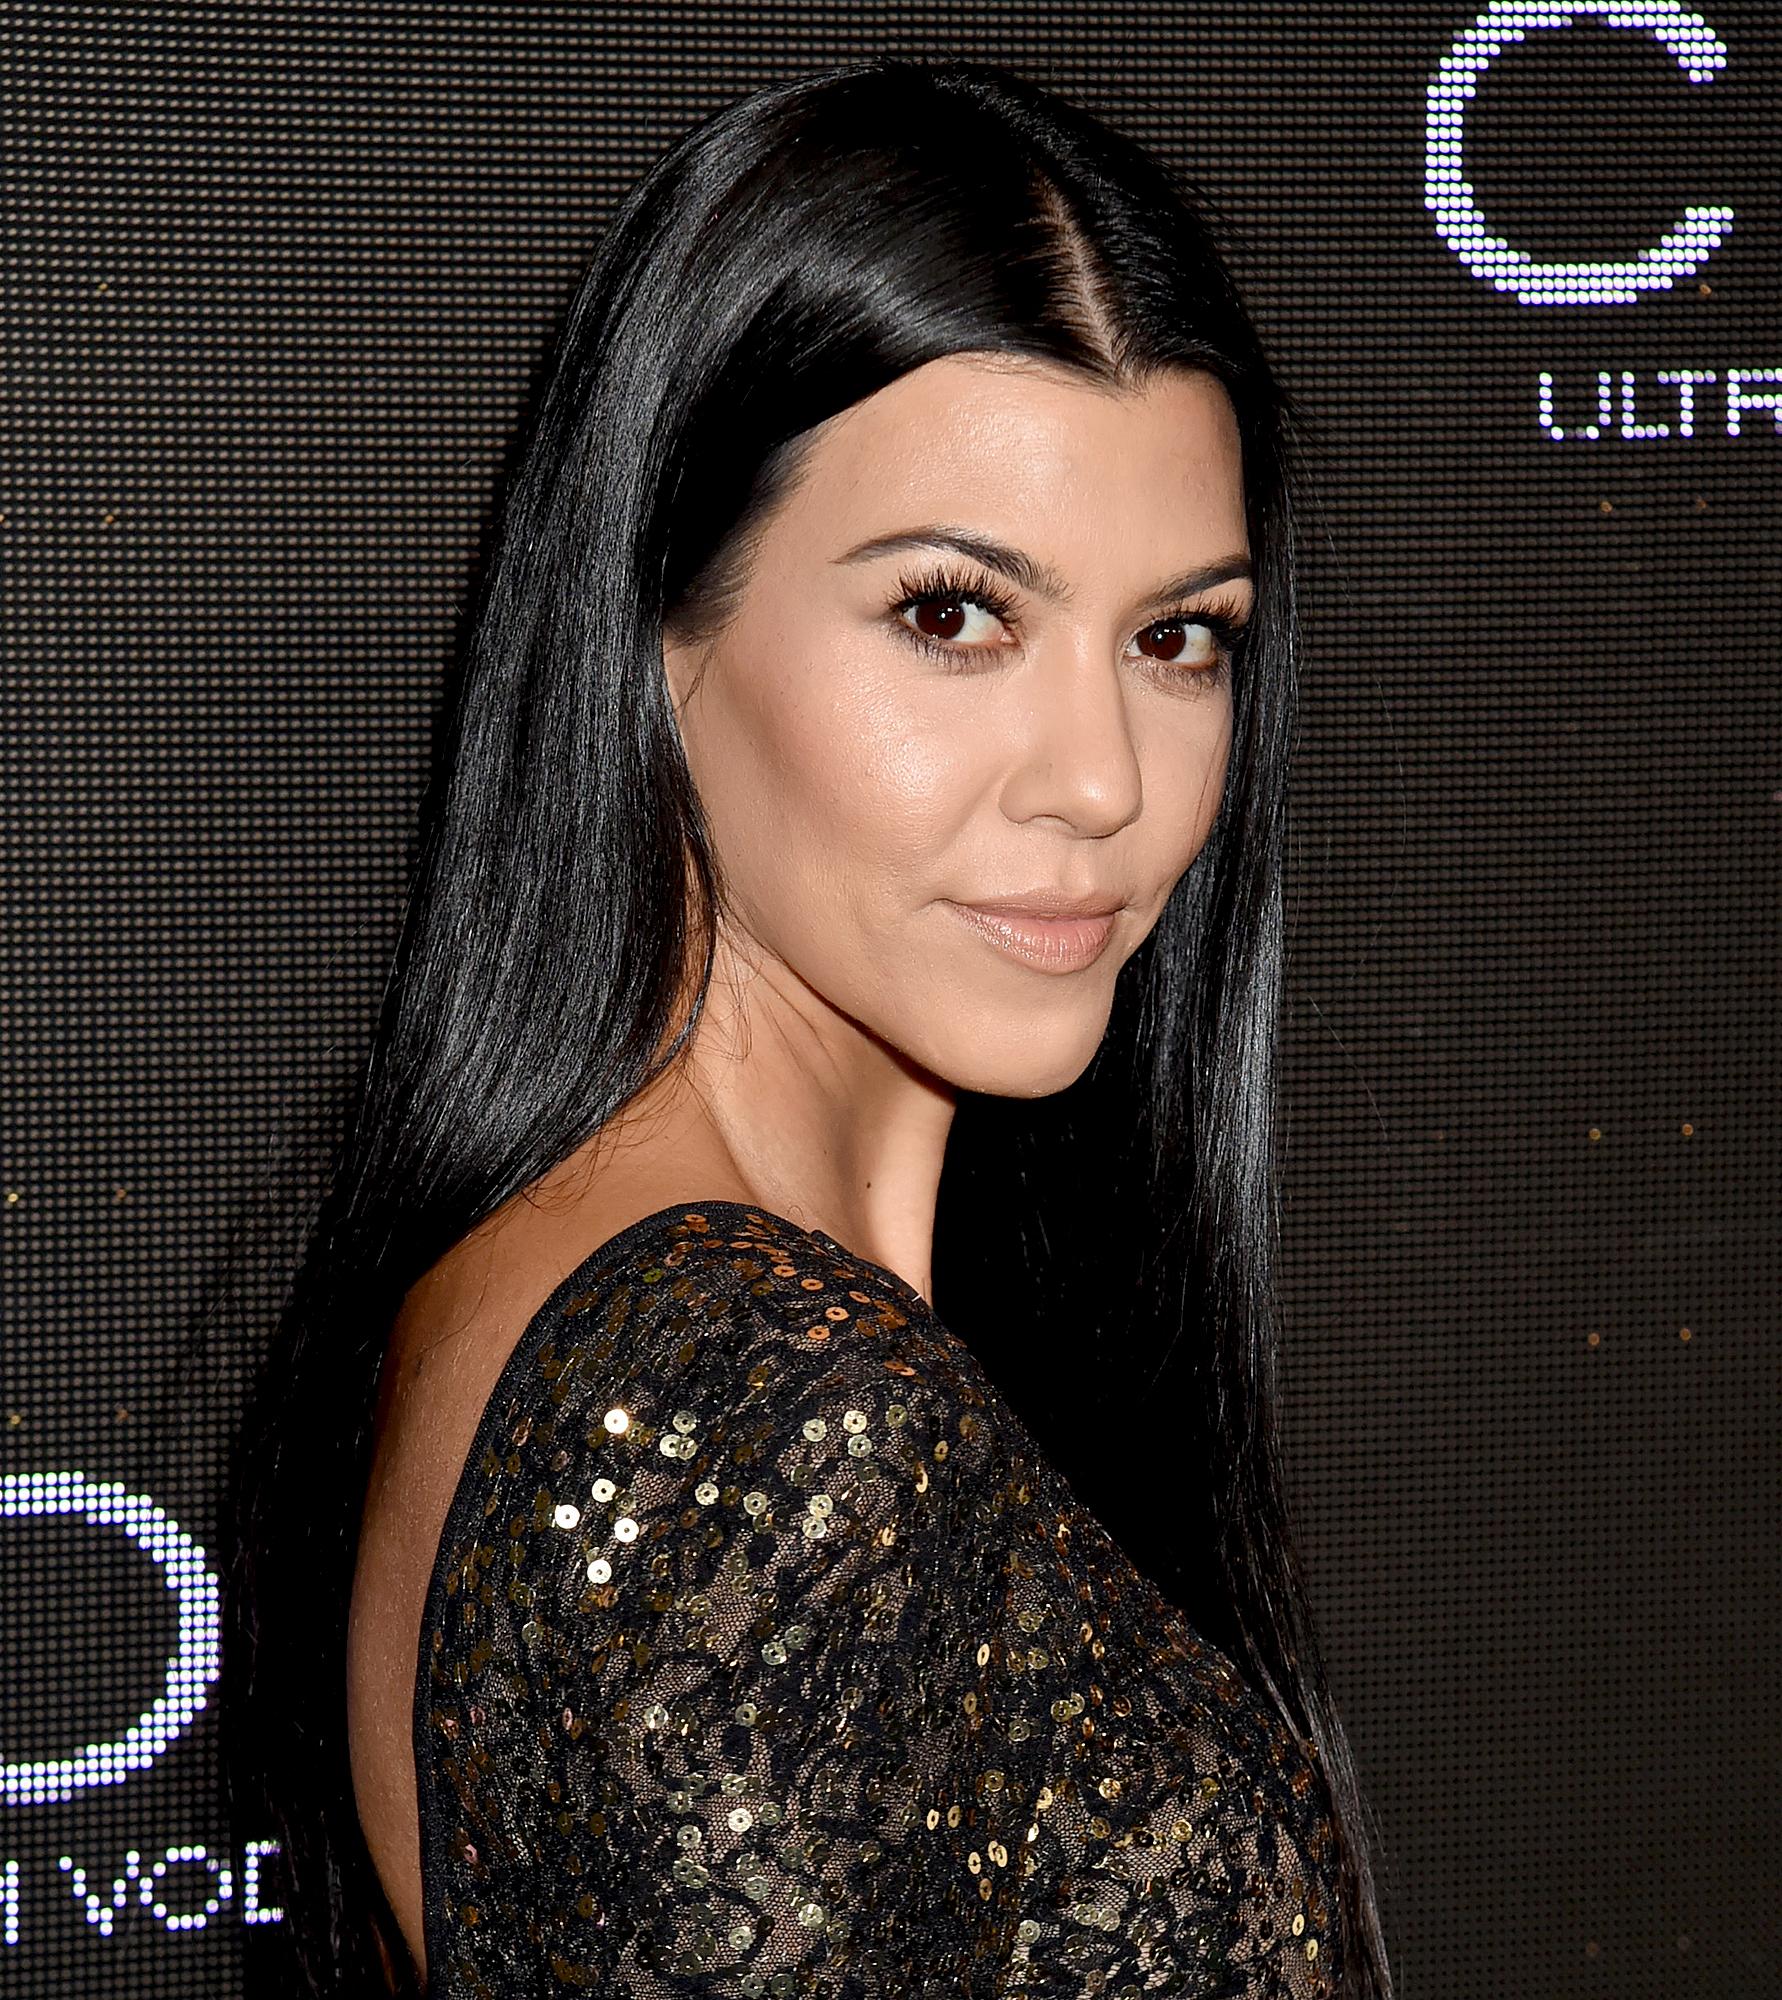 Wanna Be Kardashian Ͽ� Kourtney Ͽ� Midnight Cuddles Ͽ� Ͽ� I: Kourtney Kardashian Drinks This Pink Moon Milk Everyday